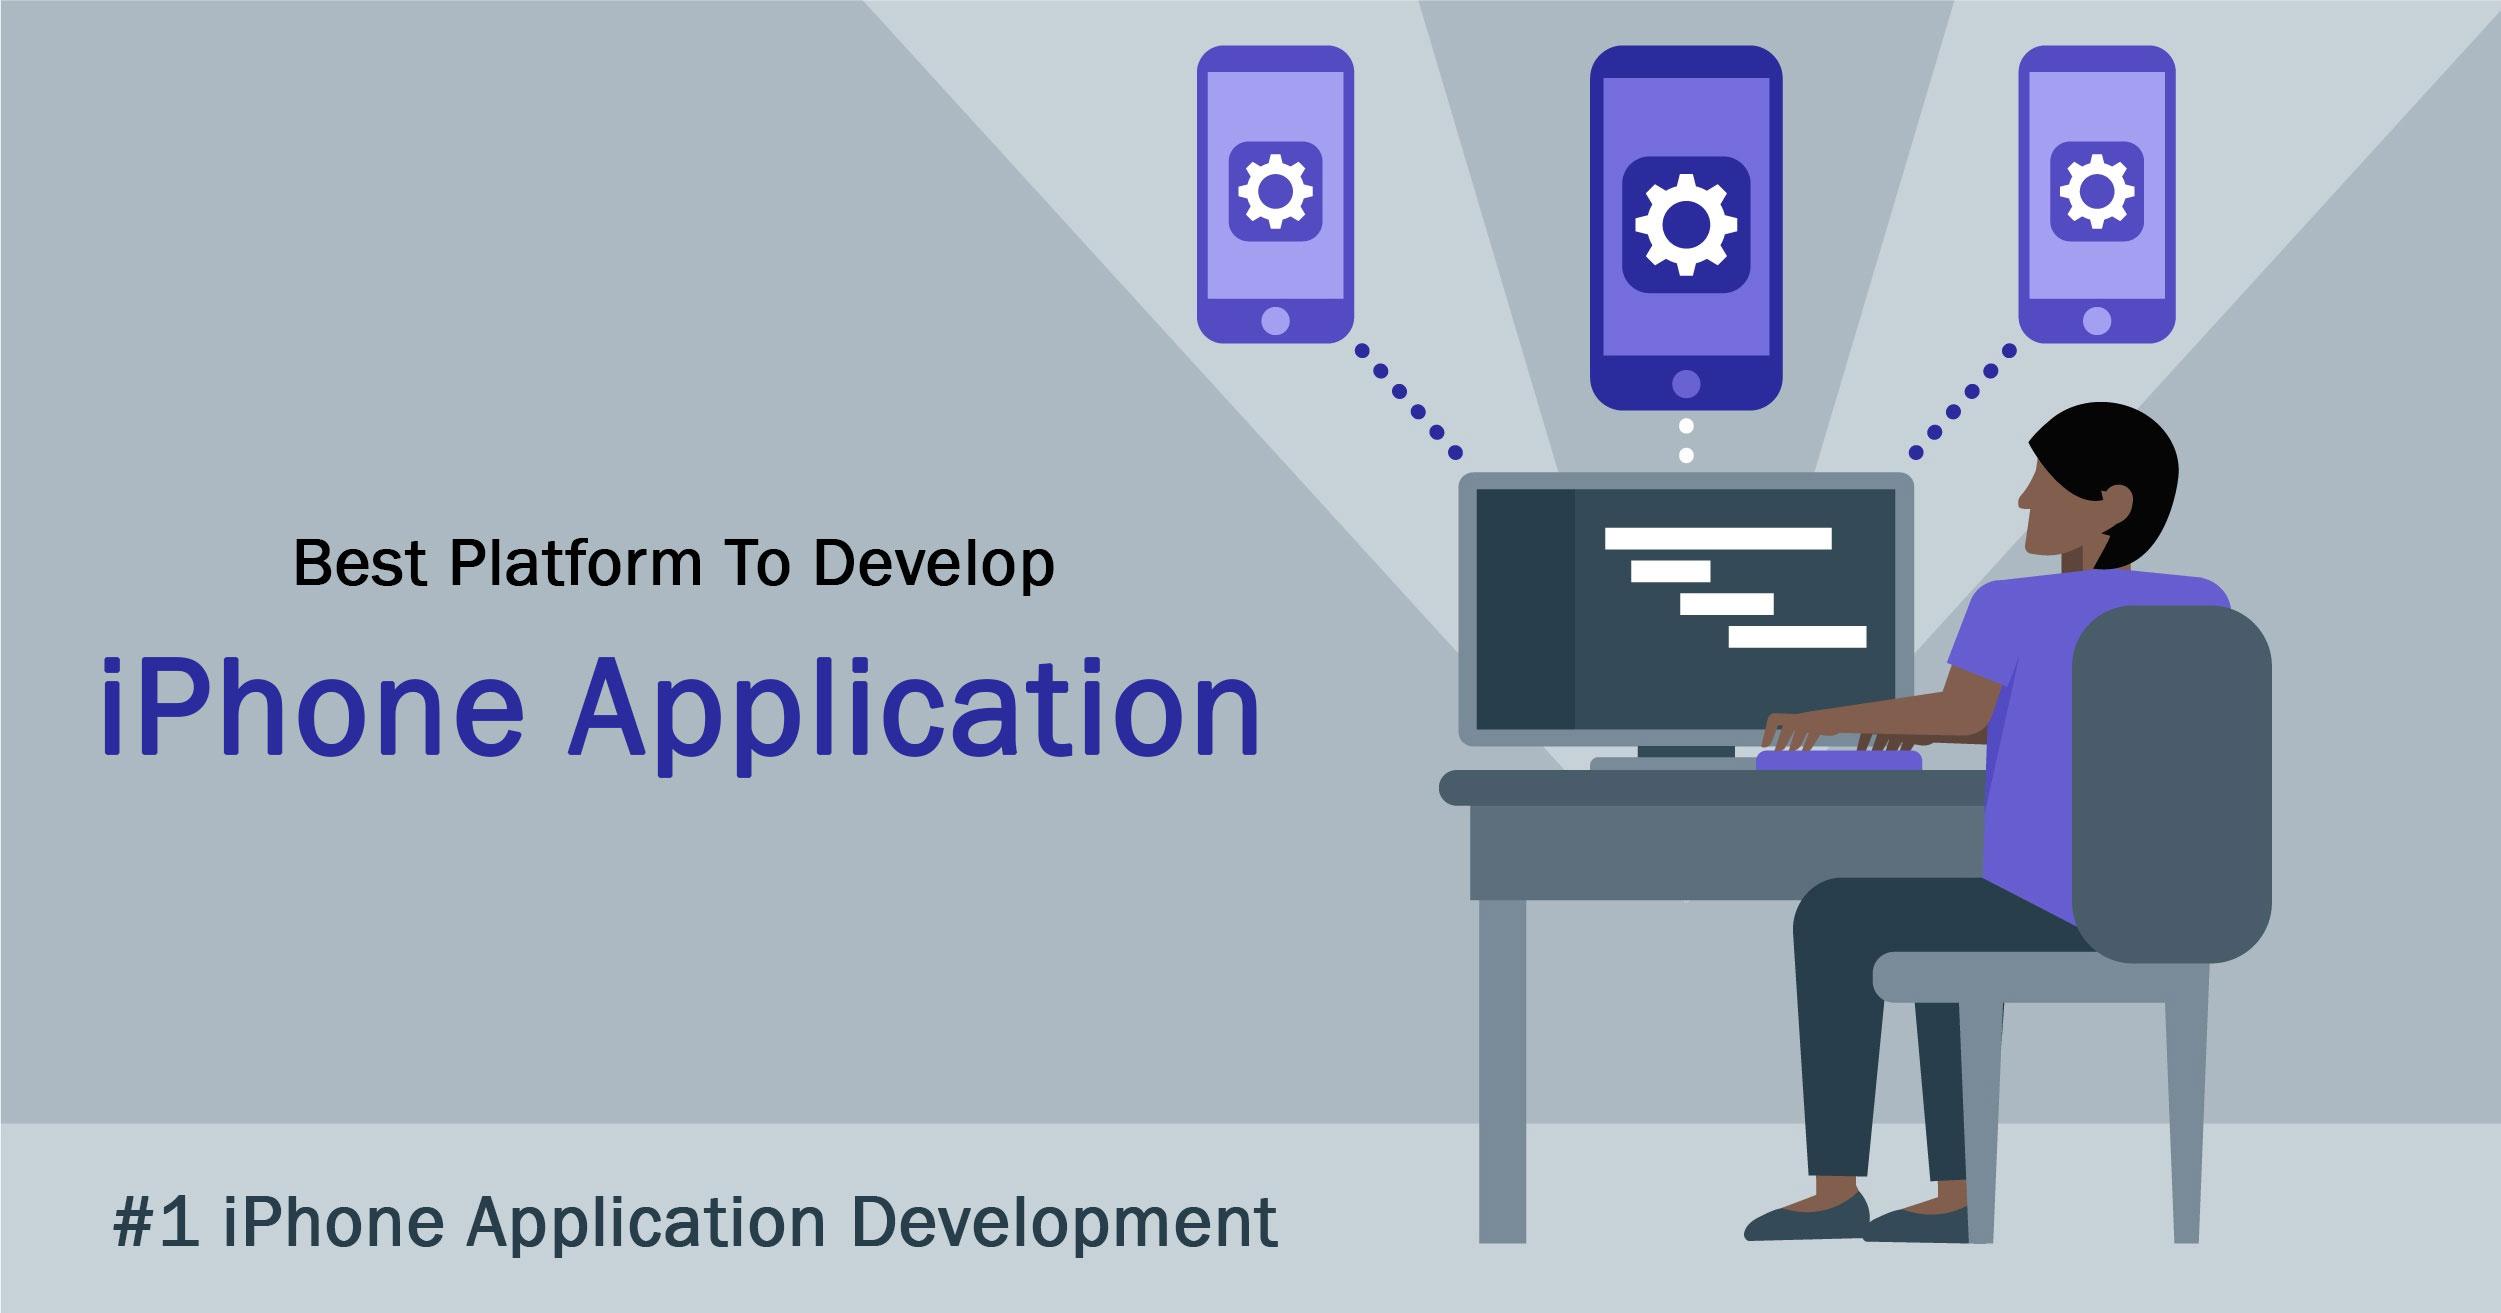 Best Platform To Develop iPhone Application Development